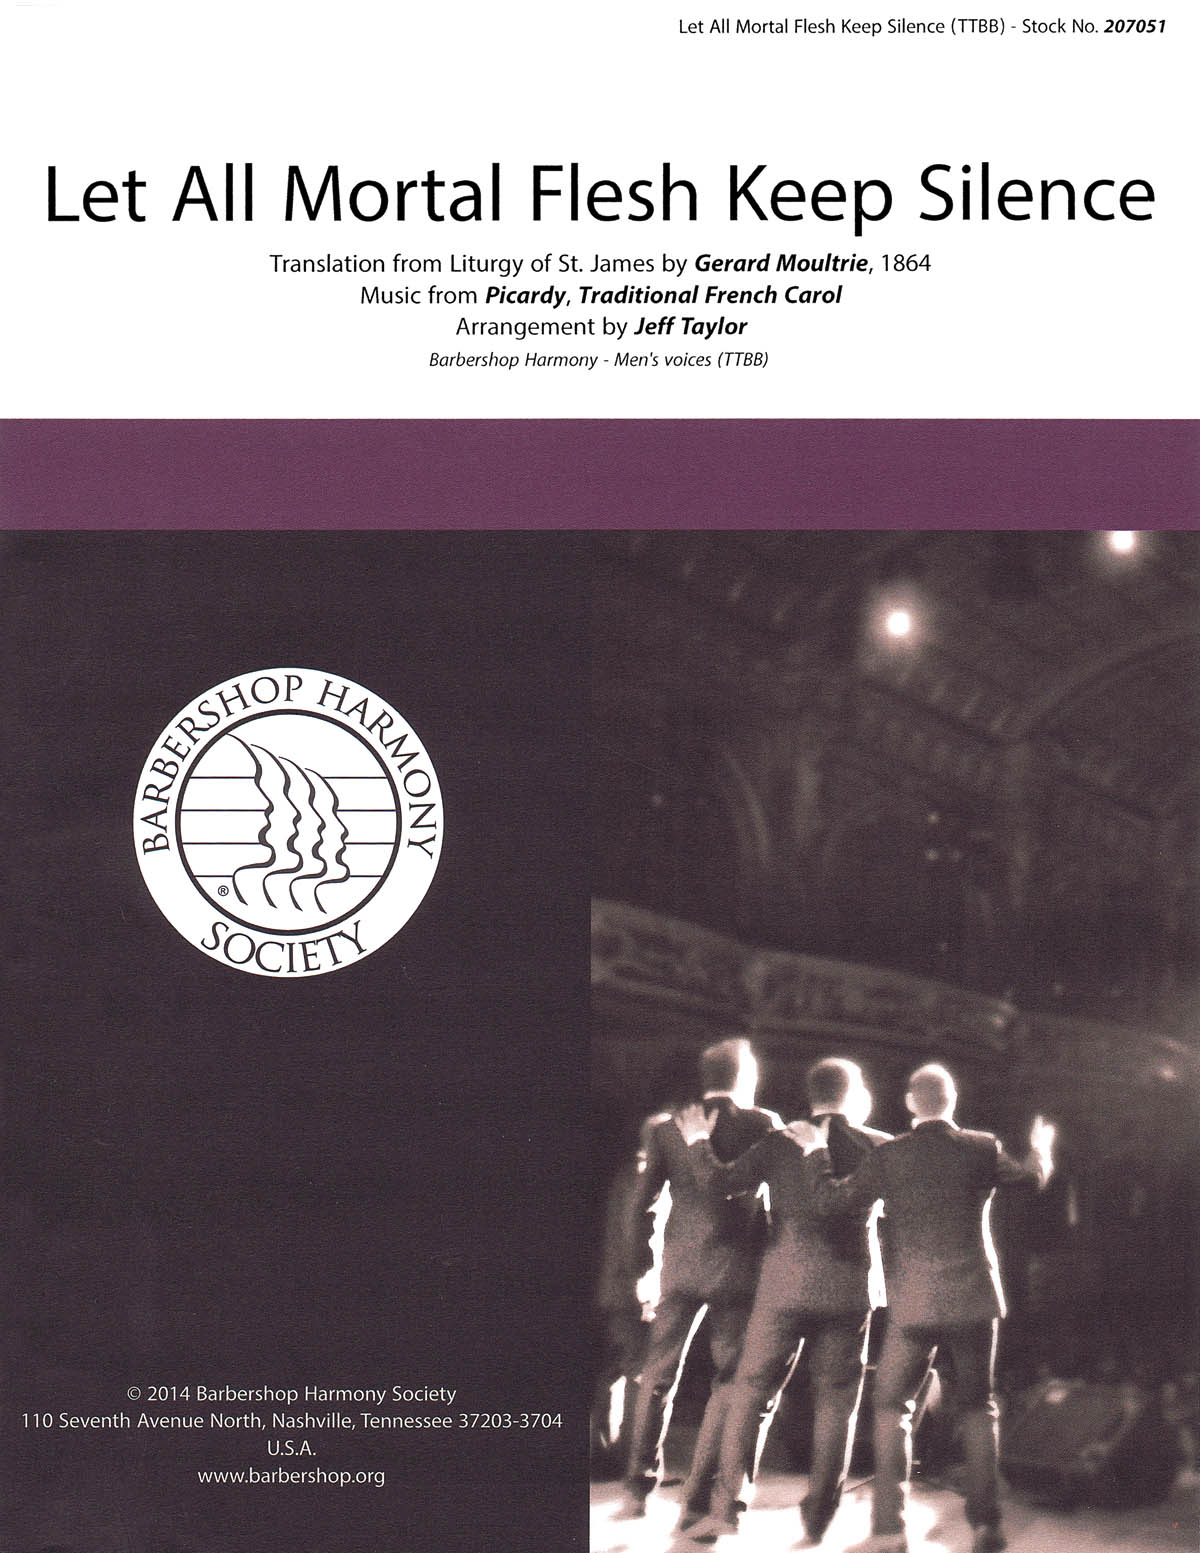 Let All Mortal Flesh Keep Silence : TTBB : Jeff Taylor : Sheet Music : 00155685 : 812817020986